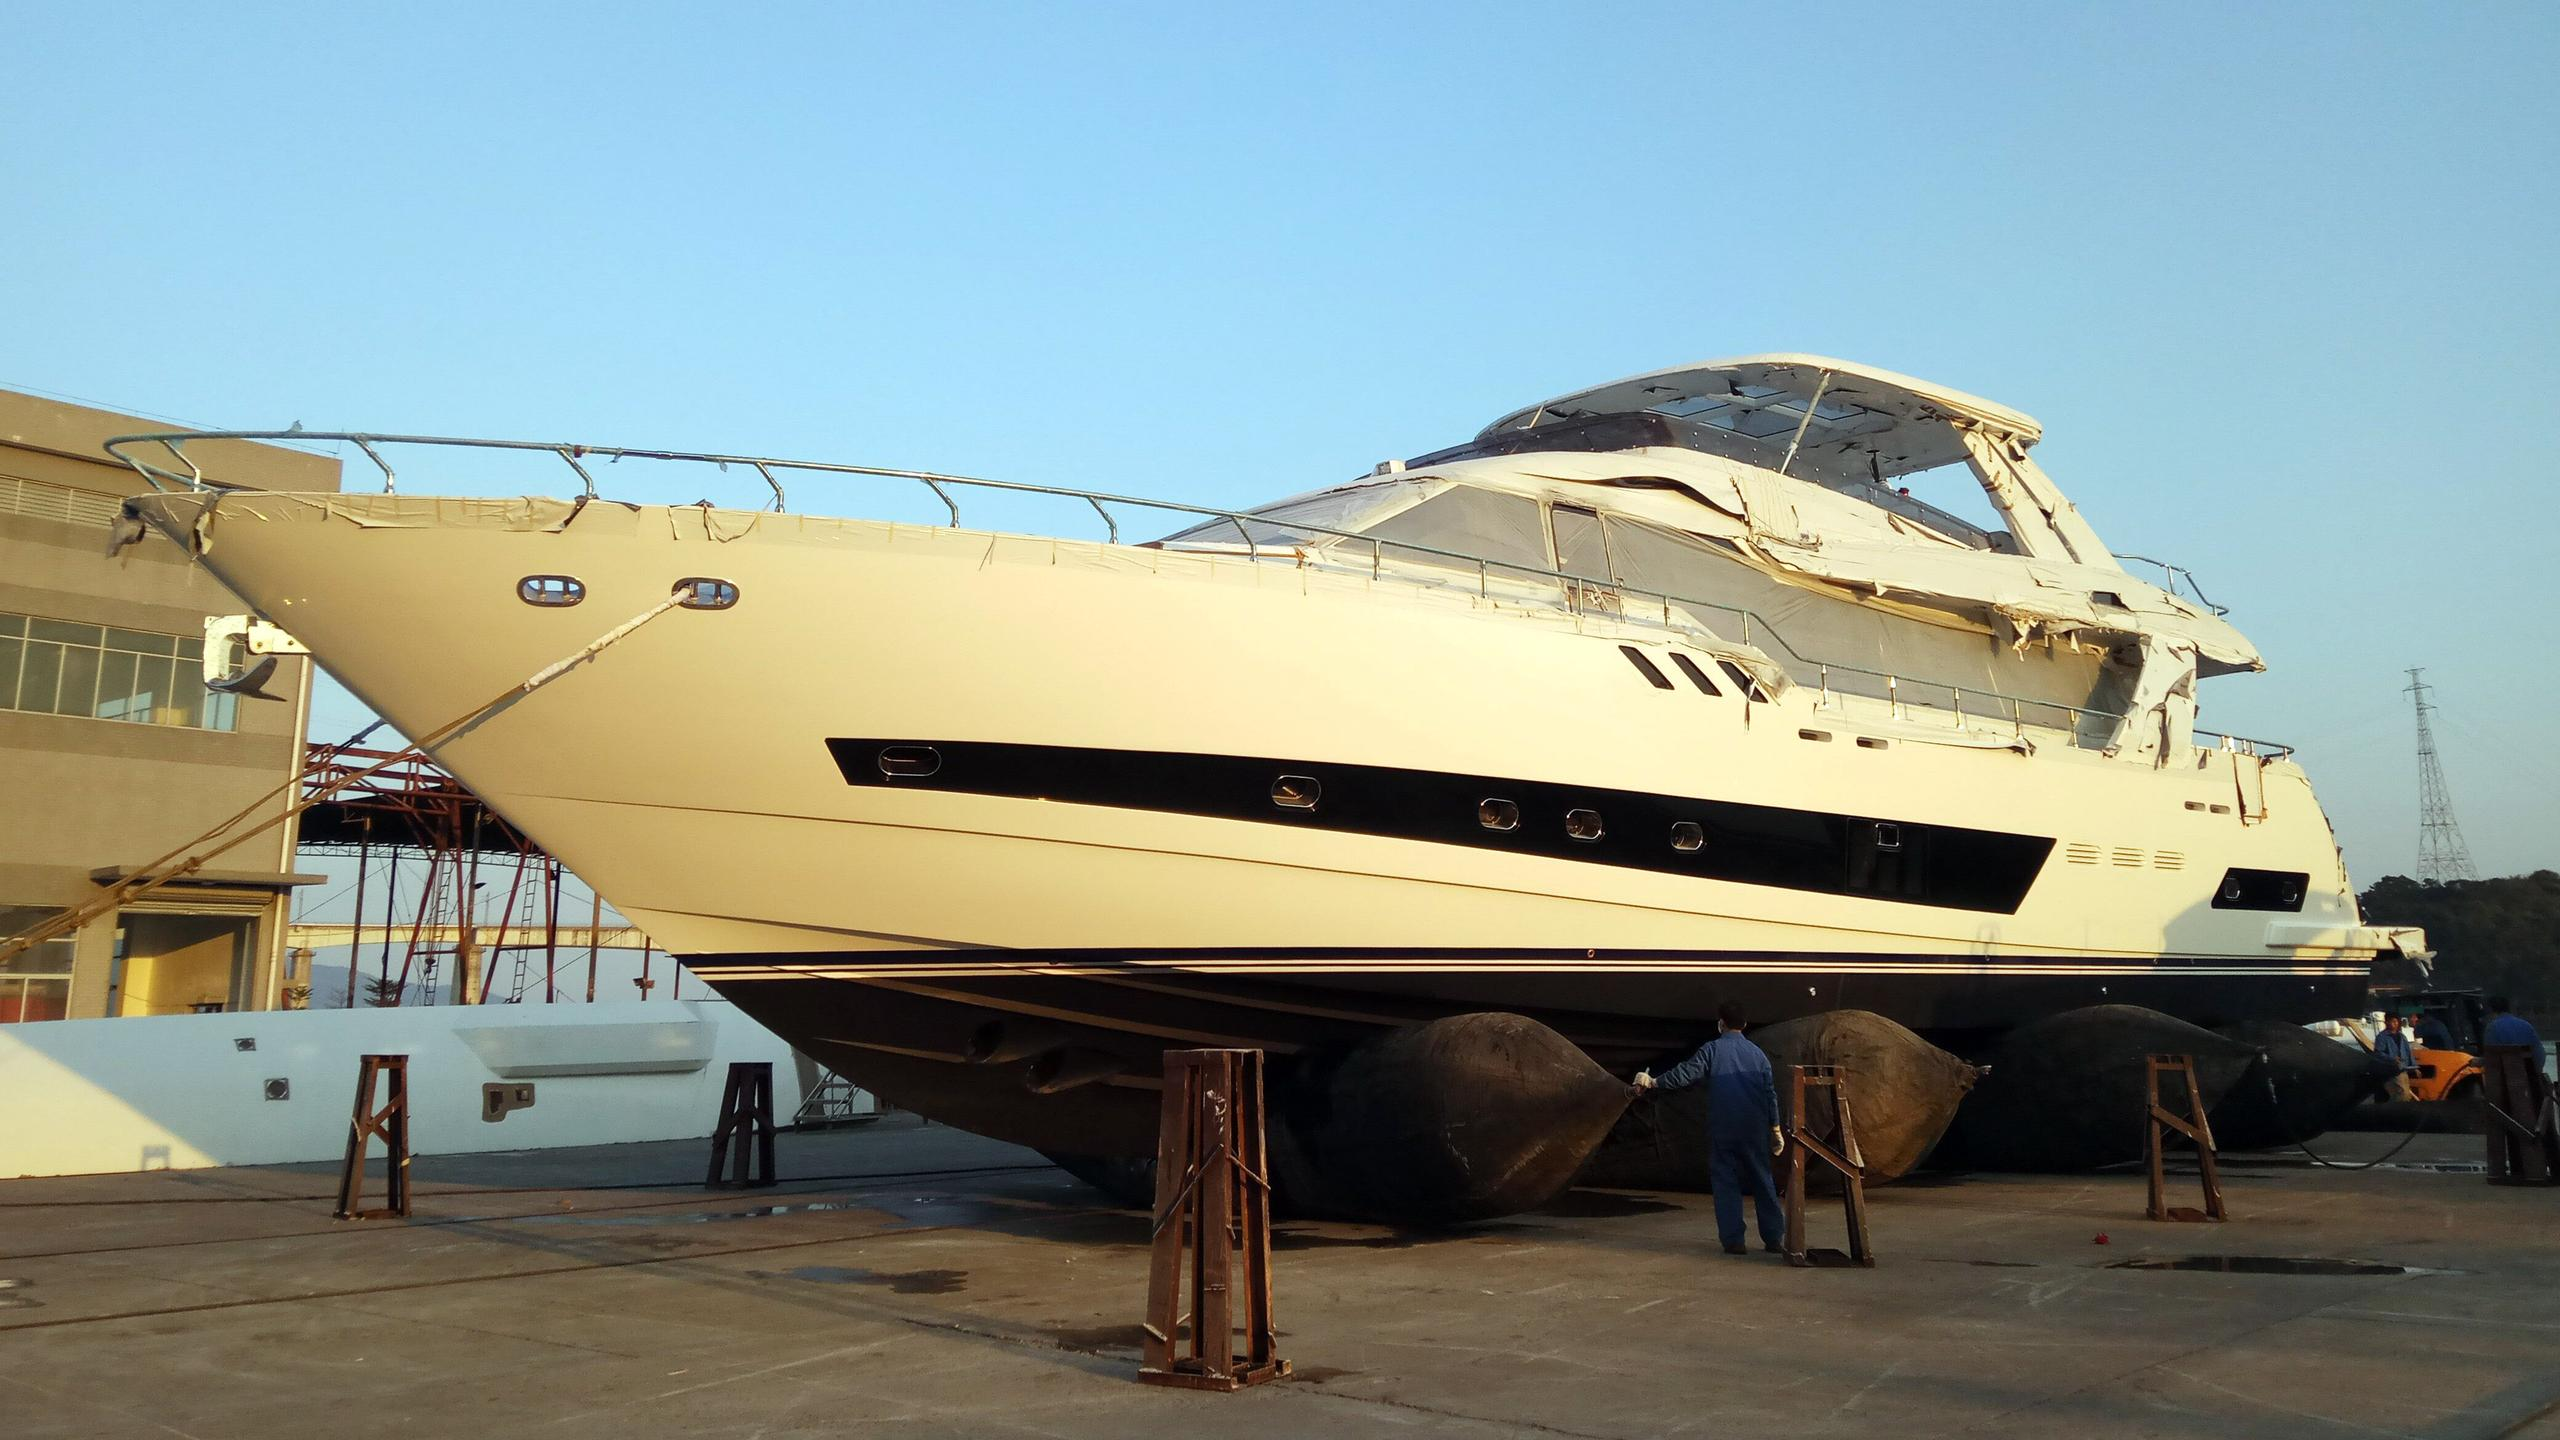 asteria 96 hull 1 motoryacht heysea 29m 2017 launch